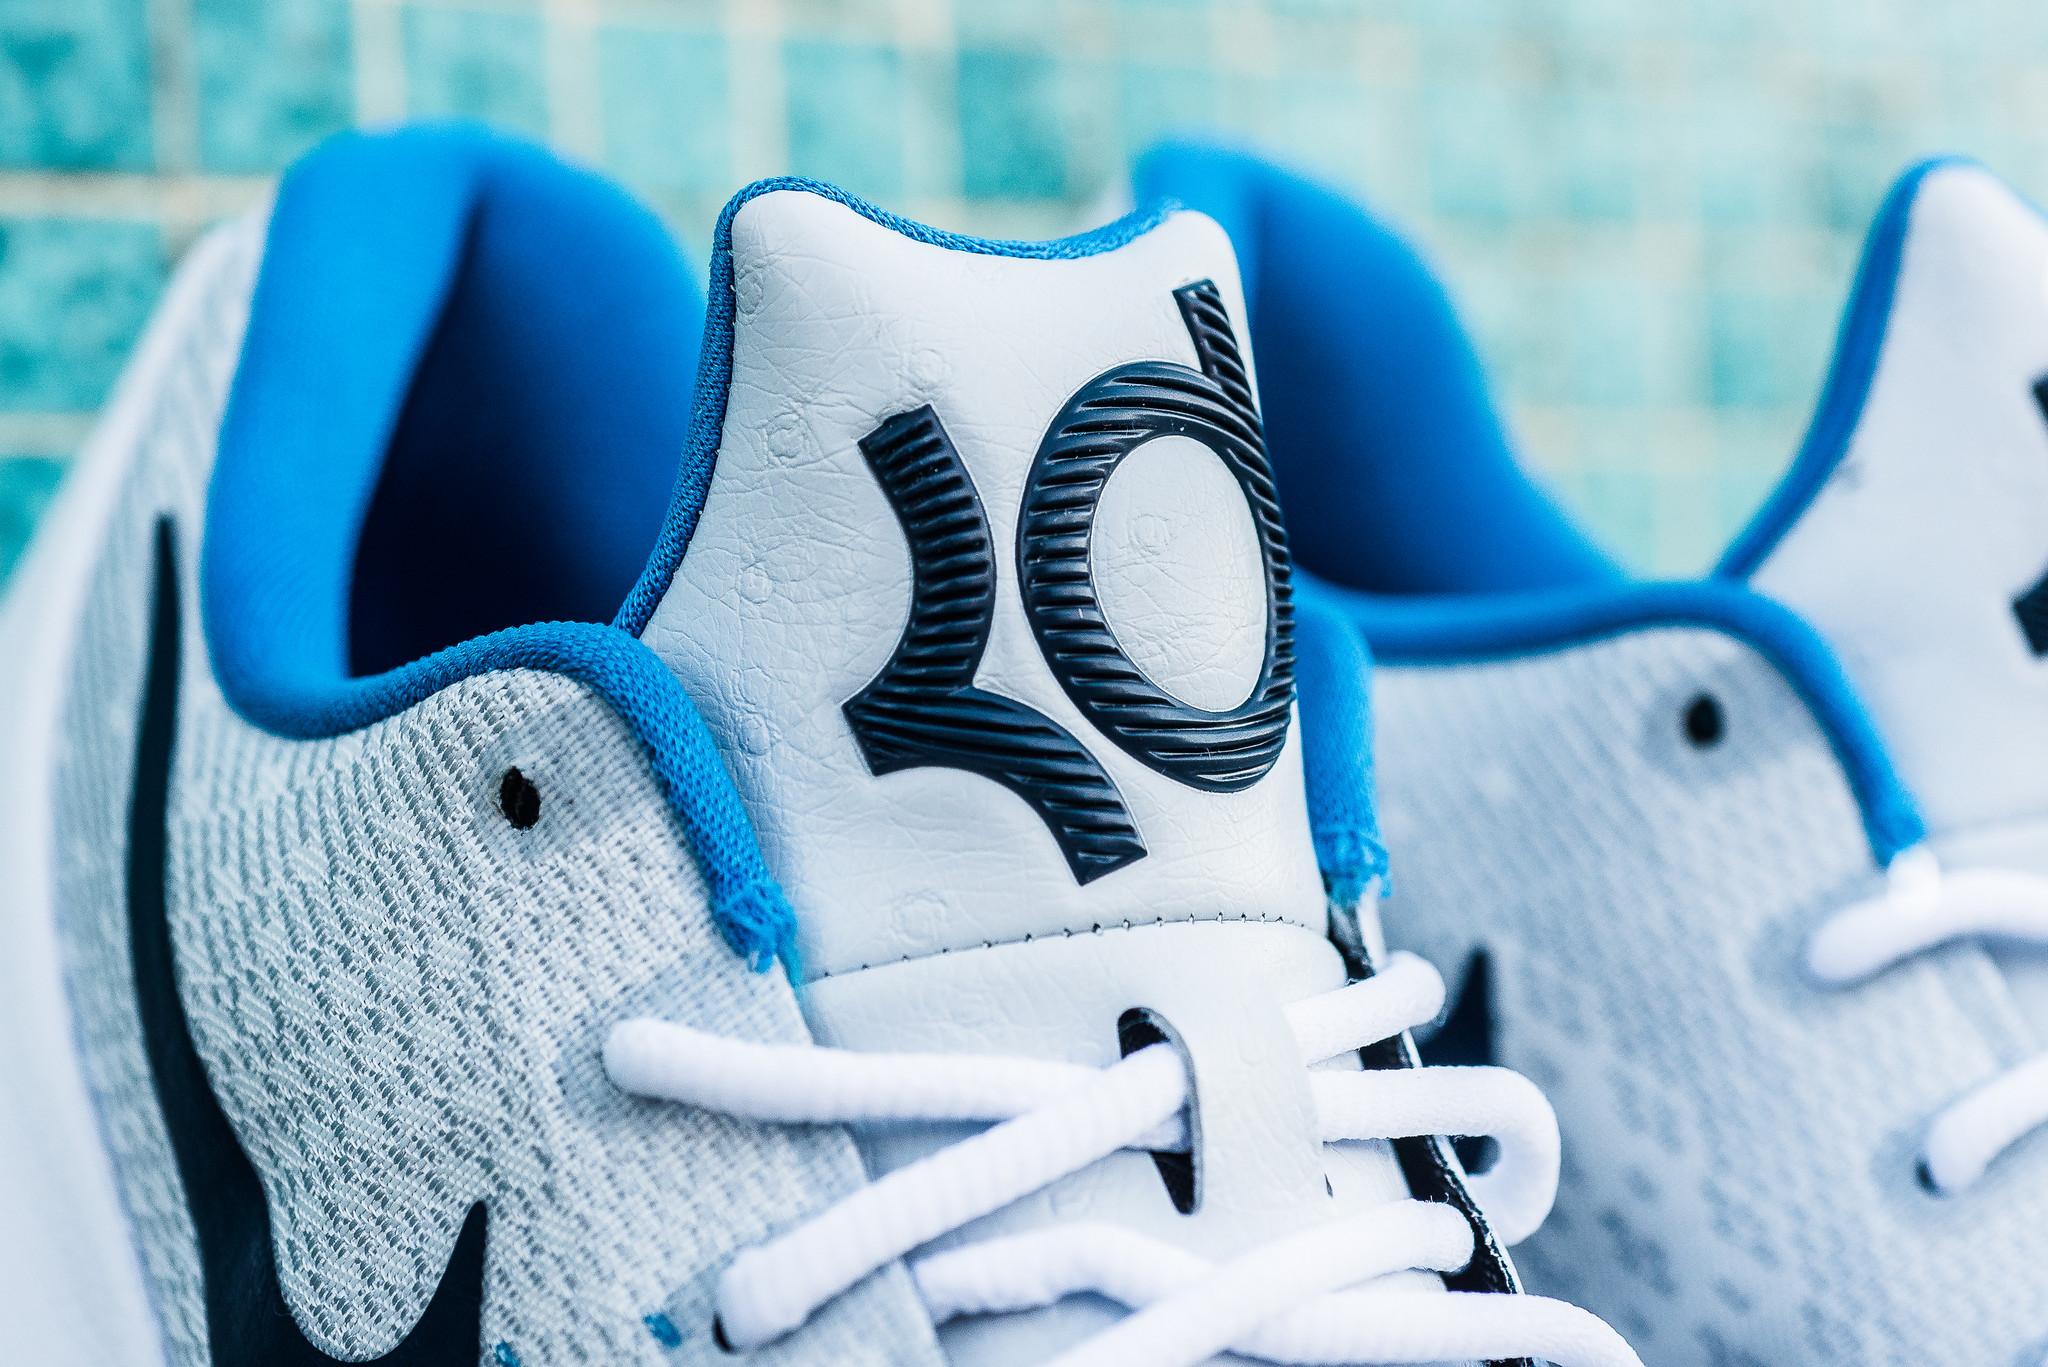 Nike_KD_8_White_Blue_Royal_Sneaker_Politics_Hypebeast_7_83ad68fc-cad5-4f7b-a3ca-0cb4a2cffe40